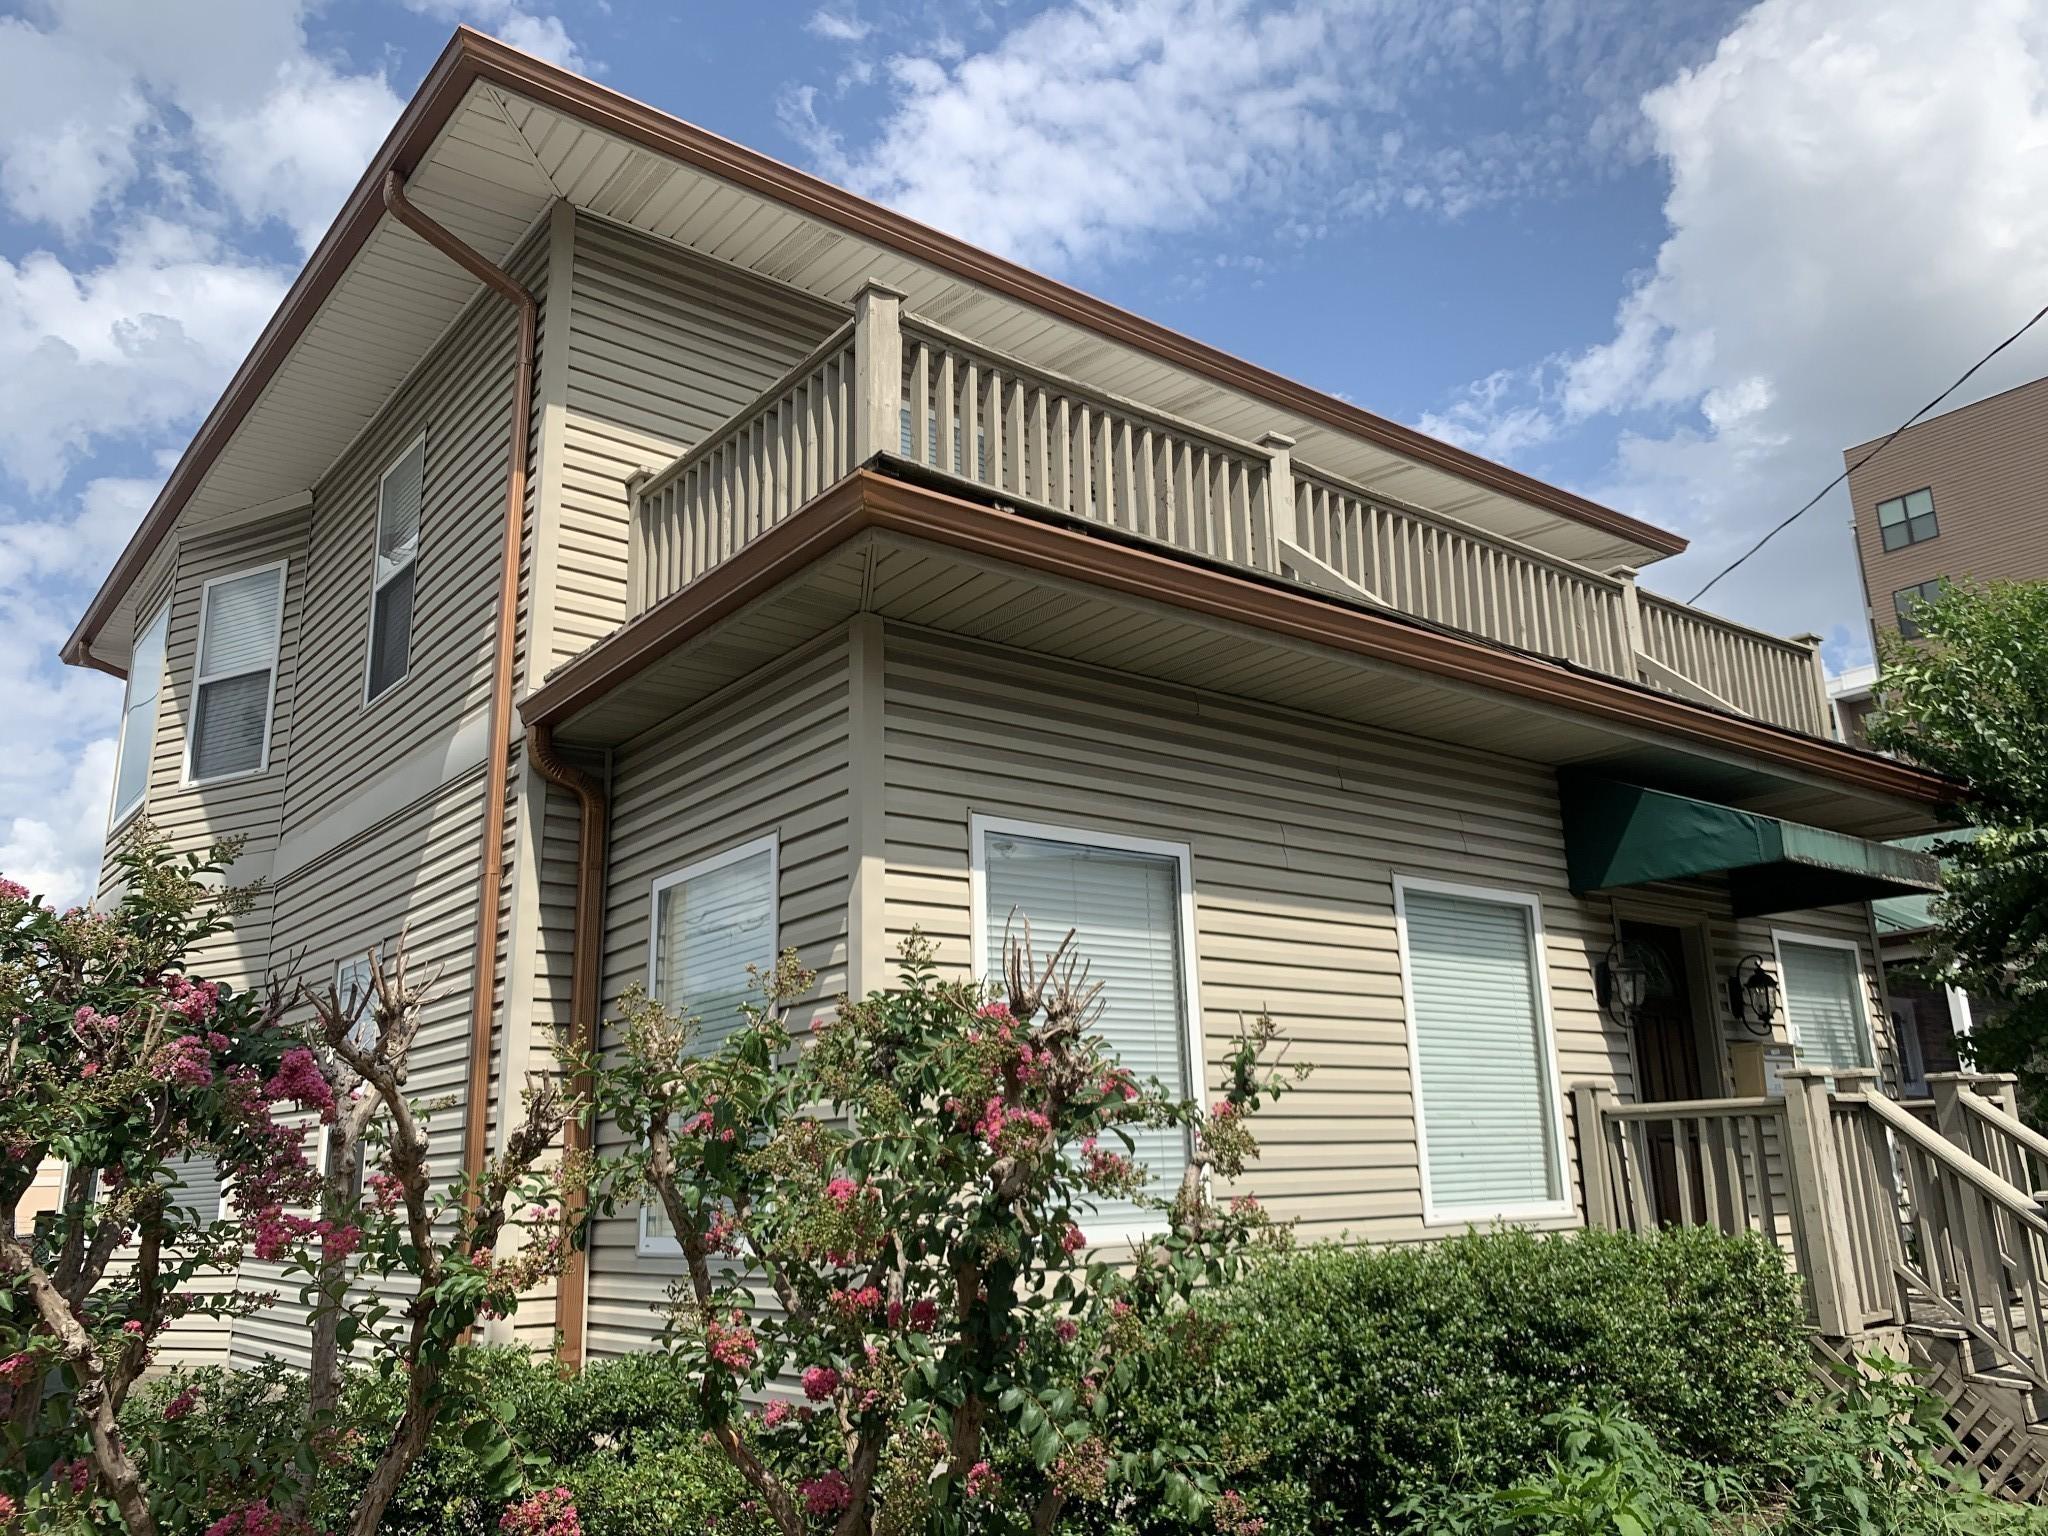 216 19th Ave, N Property Photo - Nashville, TN real estate listing